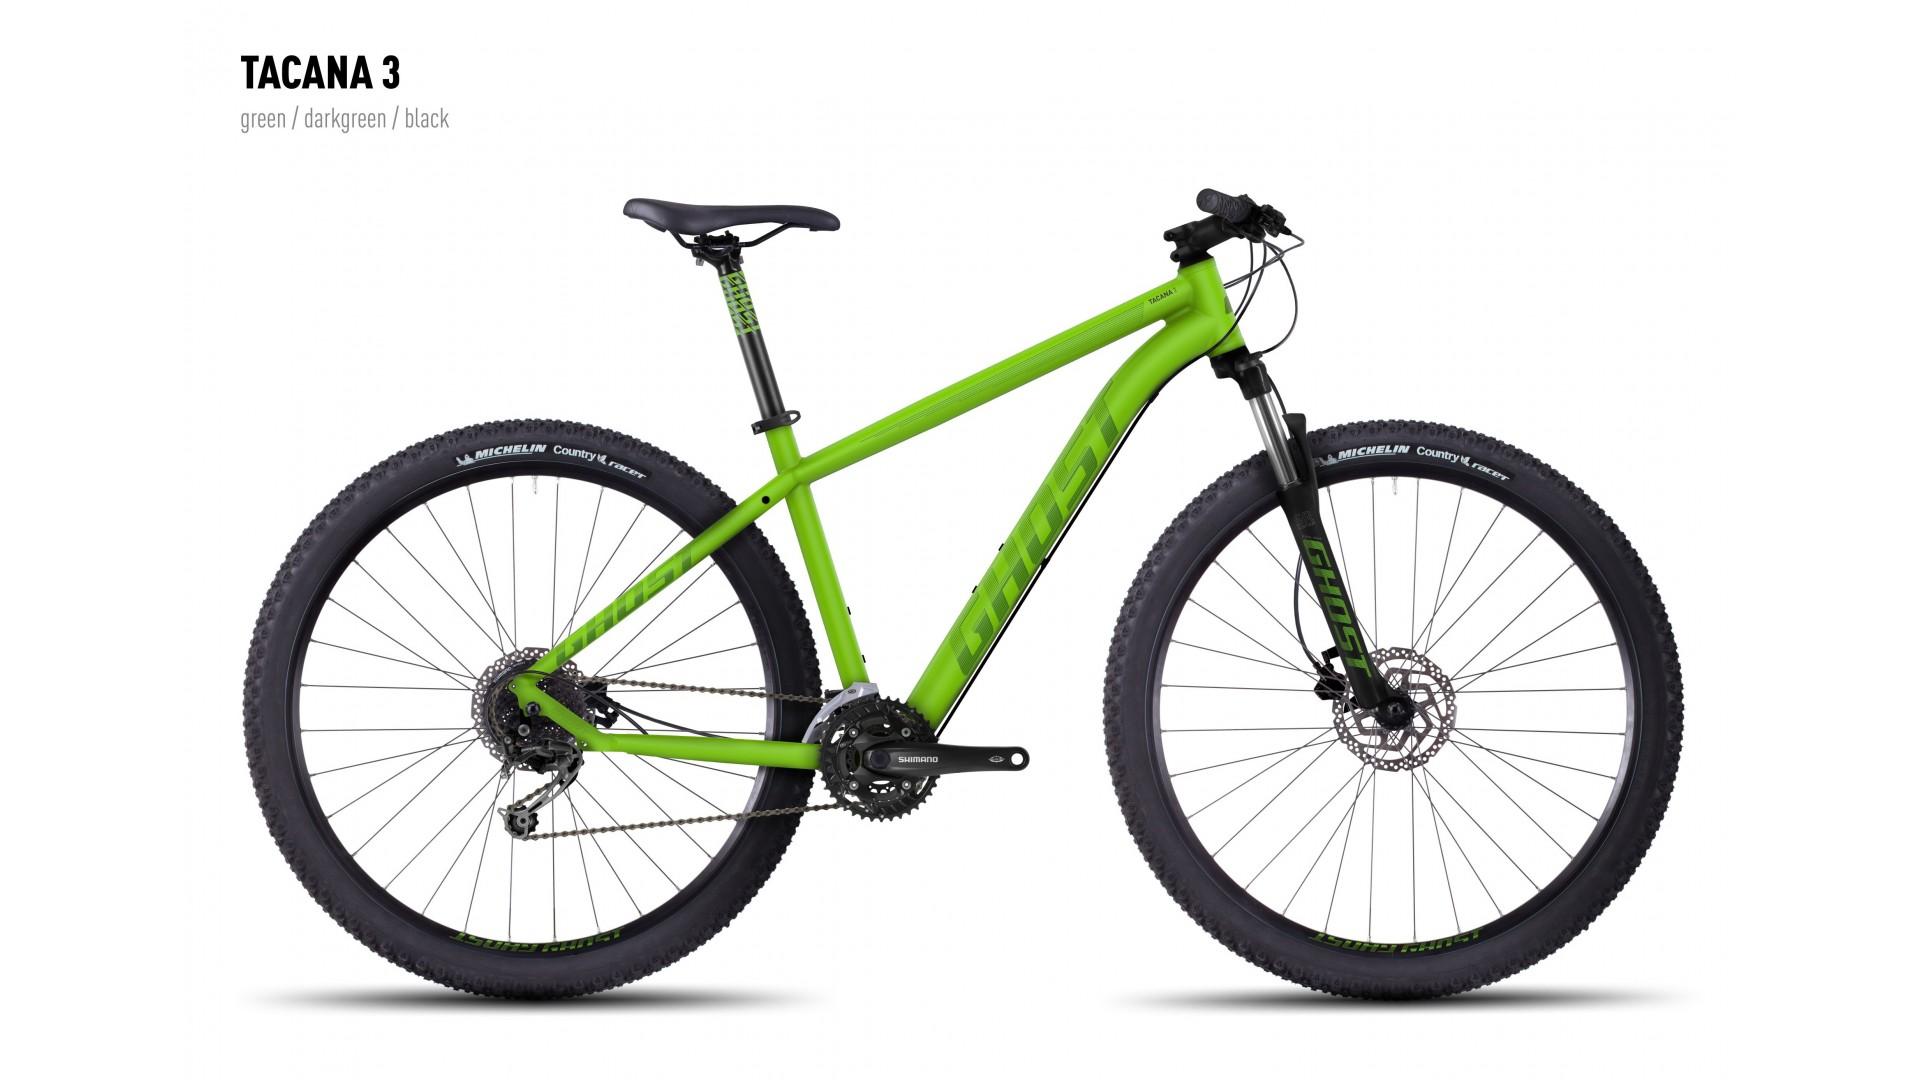 Велосипед GHOST Tacana 3 green/darkgreen/black год 2016